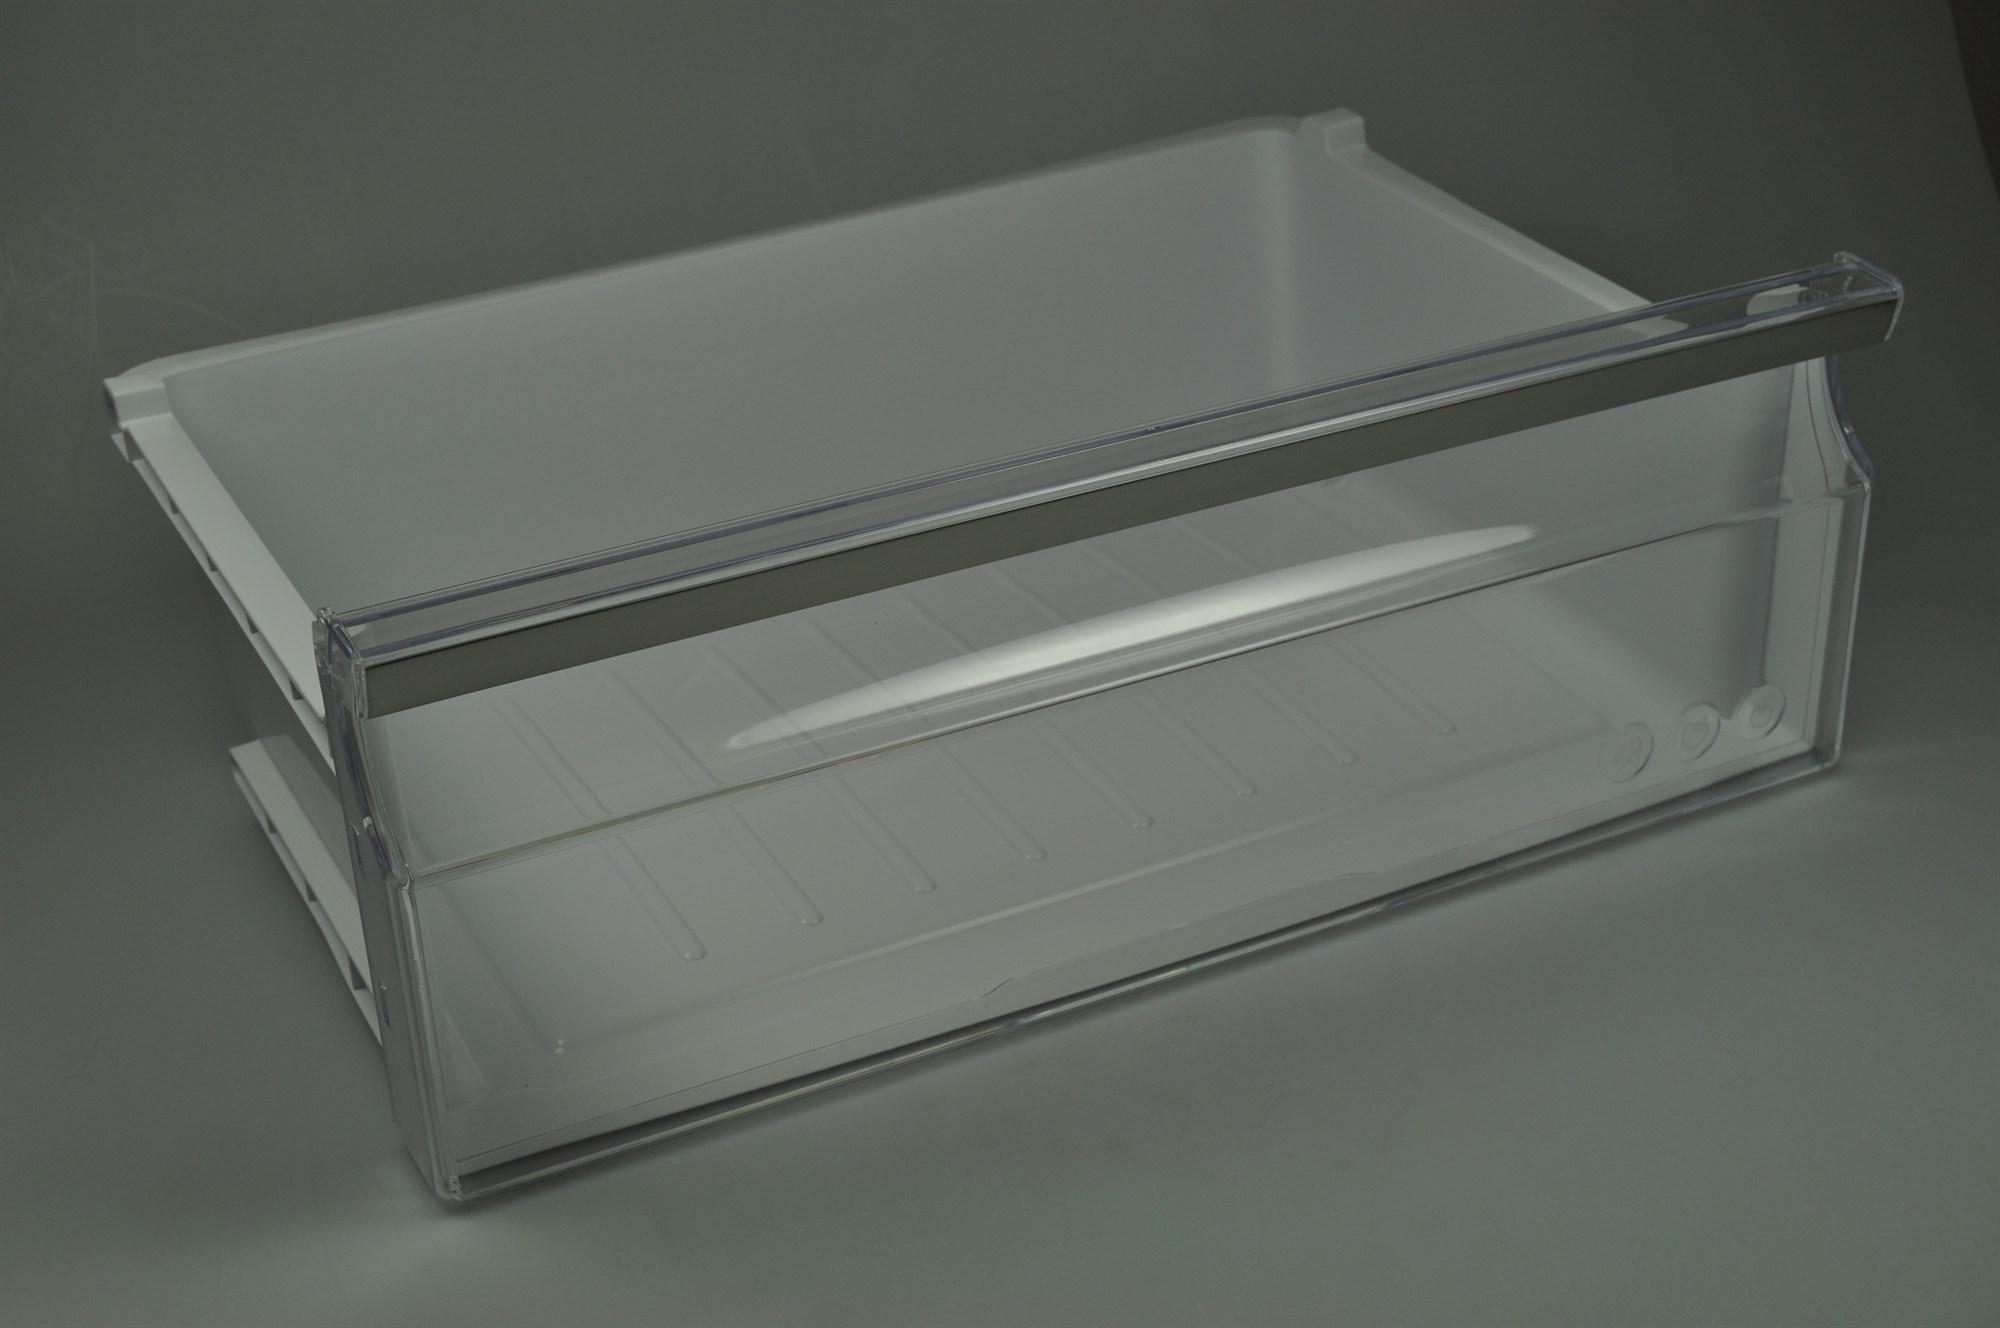 bac l gume samsung frigo cong lateur 495mm x 355mm x 180mm sup rieur. Black Bedroom Furniture Sets. Home Design Ideas